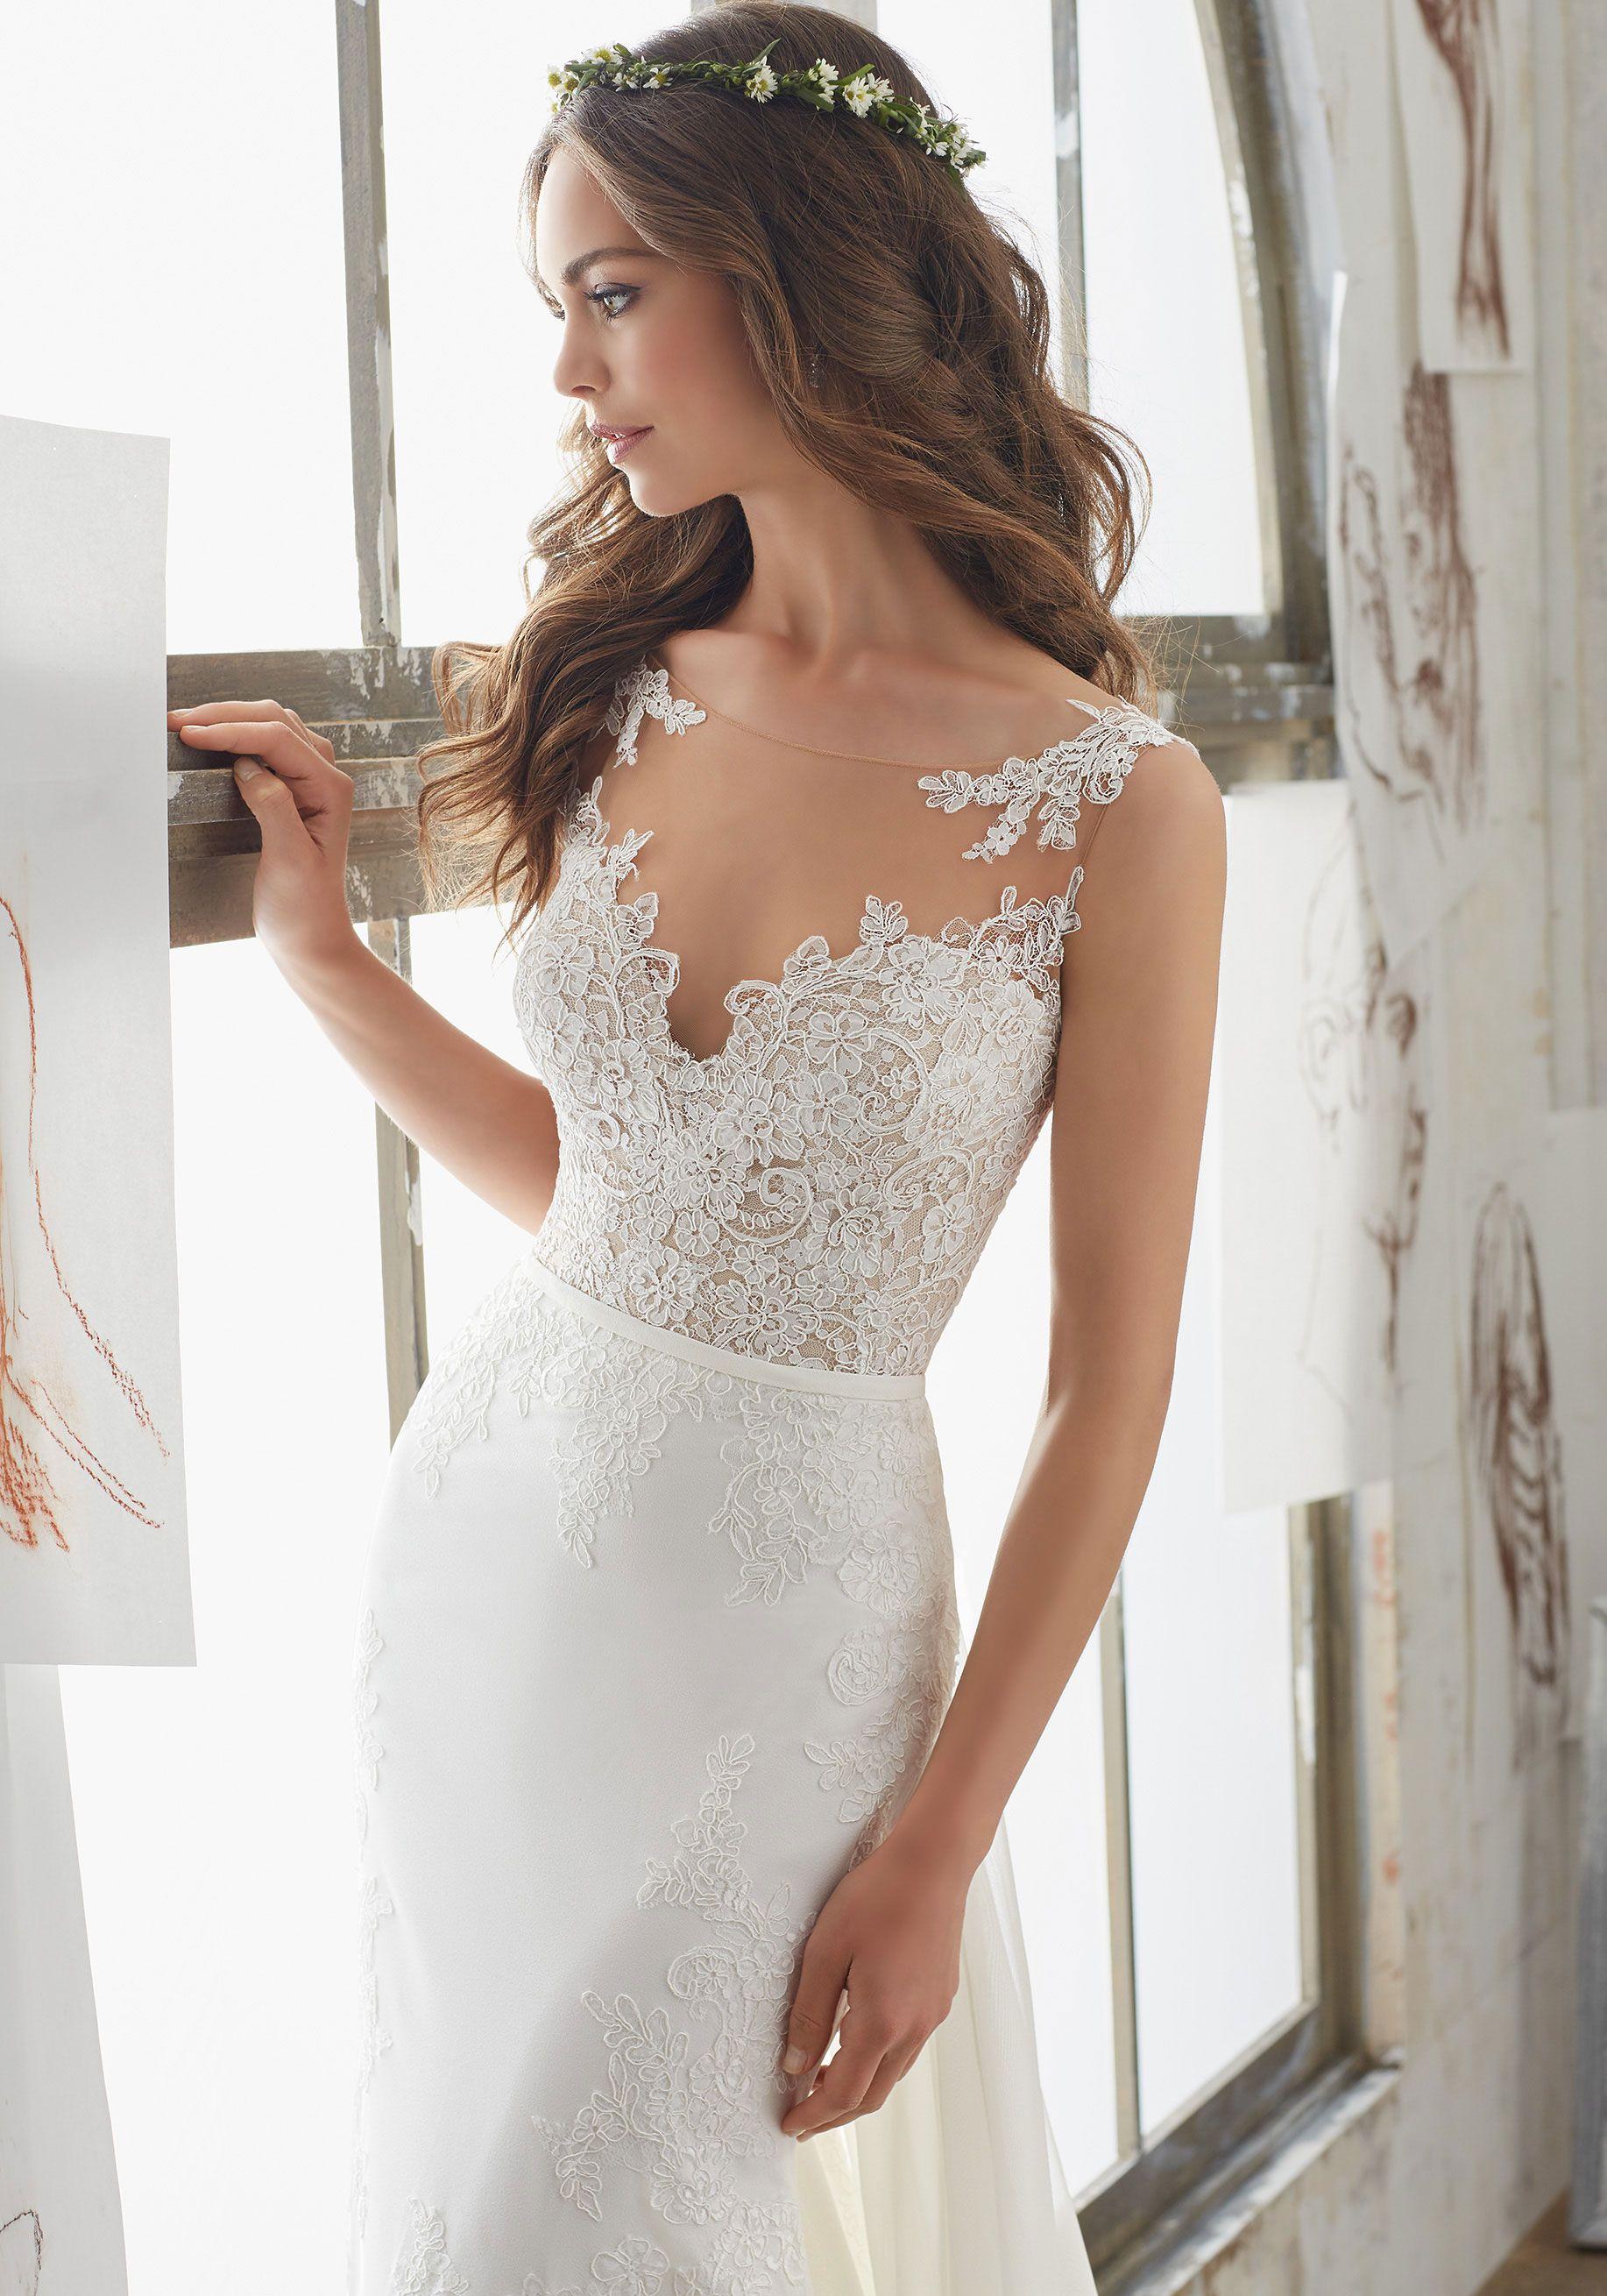 Marisol Wedding Dress Wedding Pinterest Wedding dresses